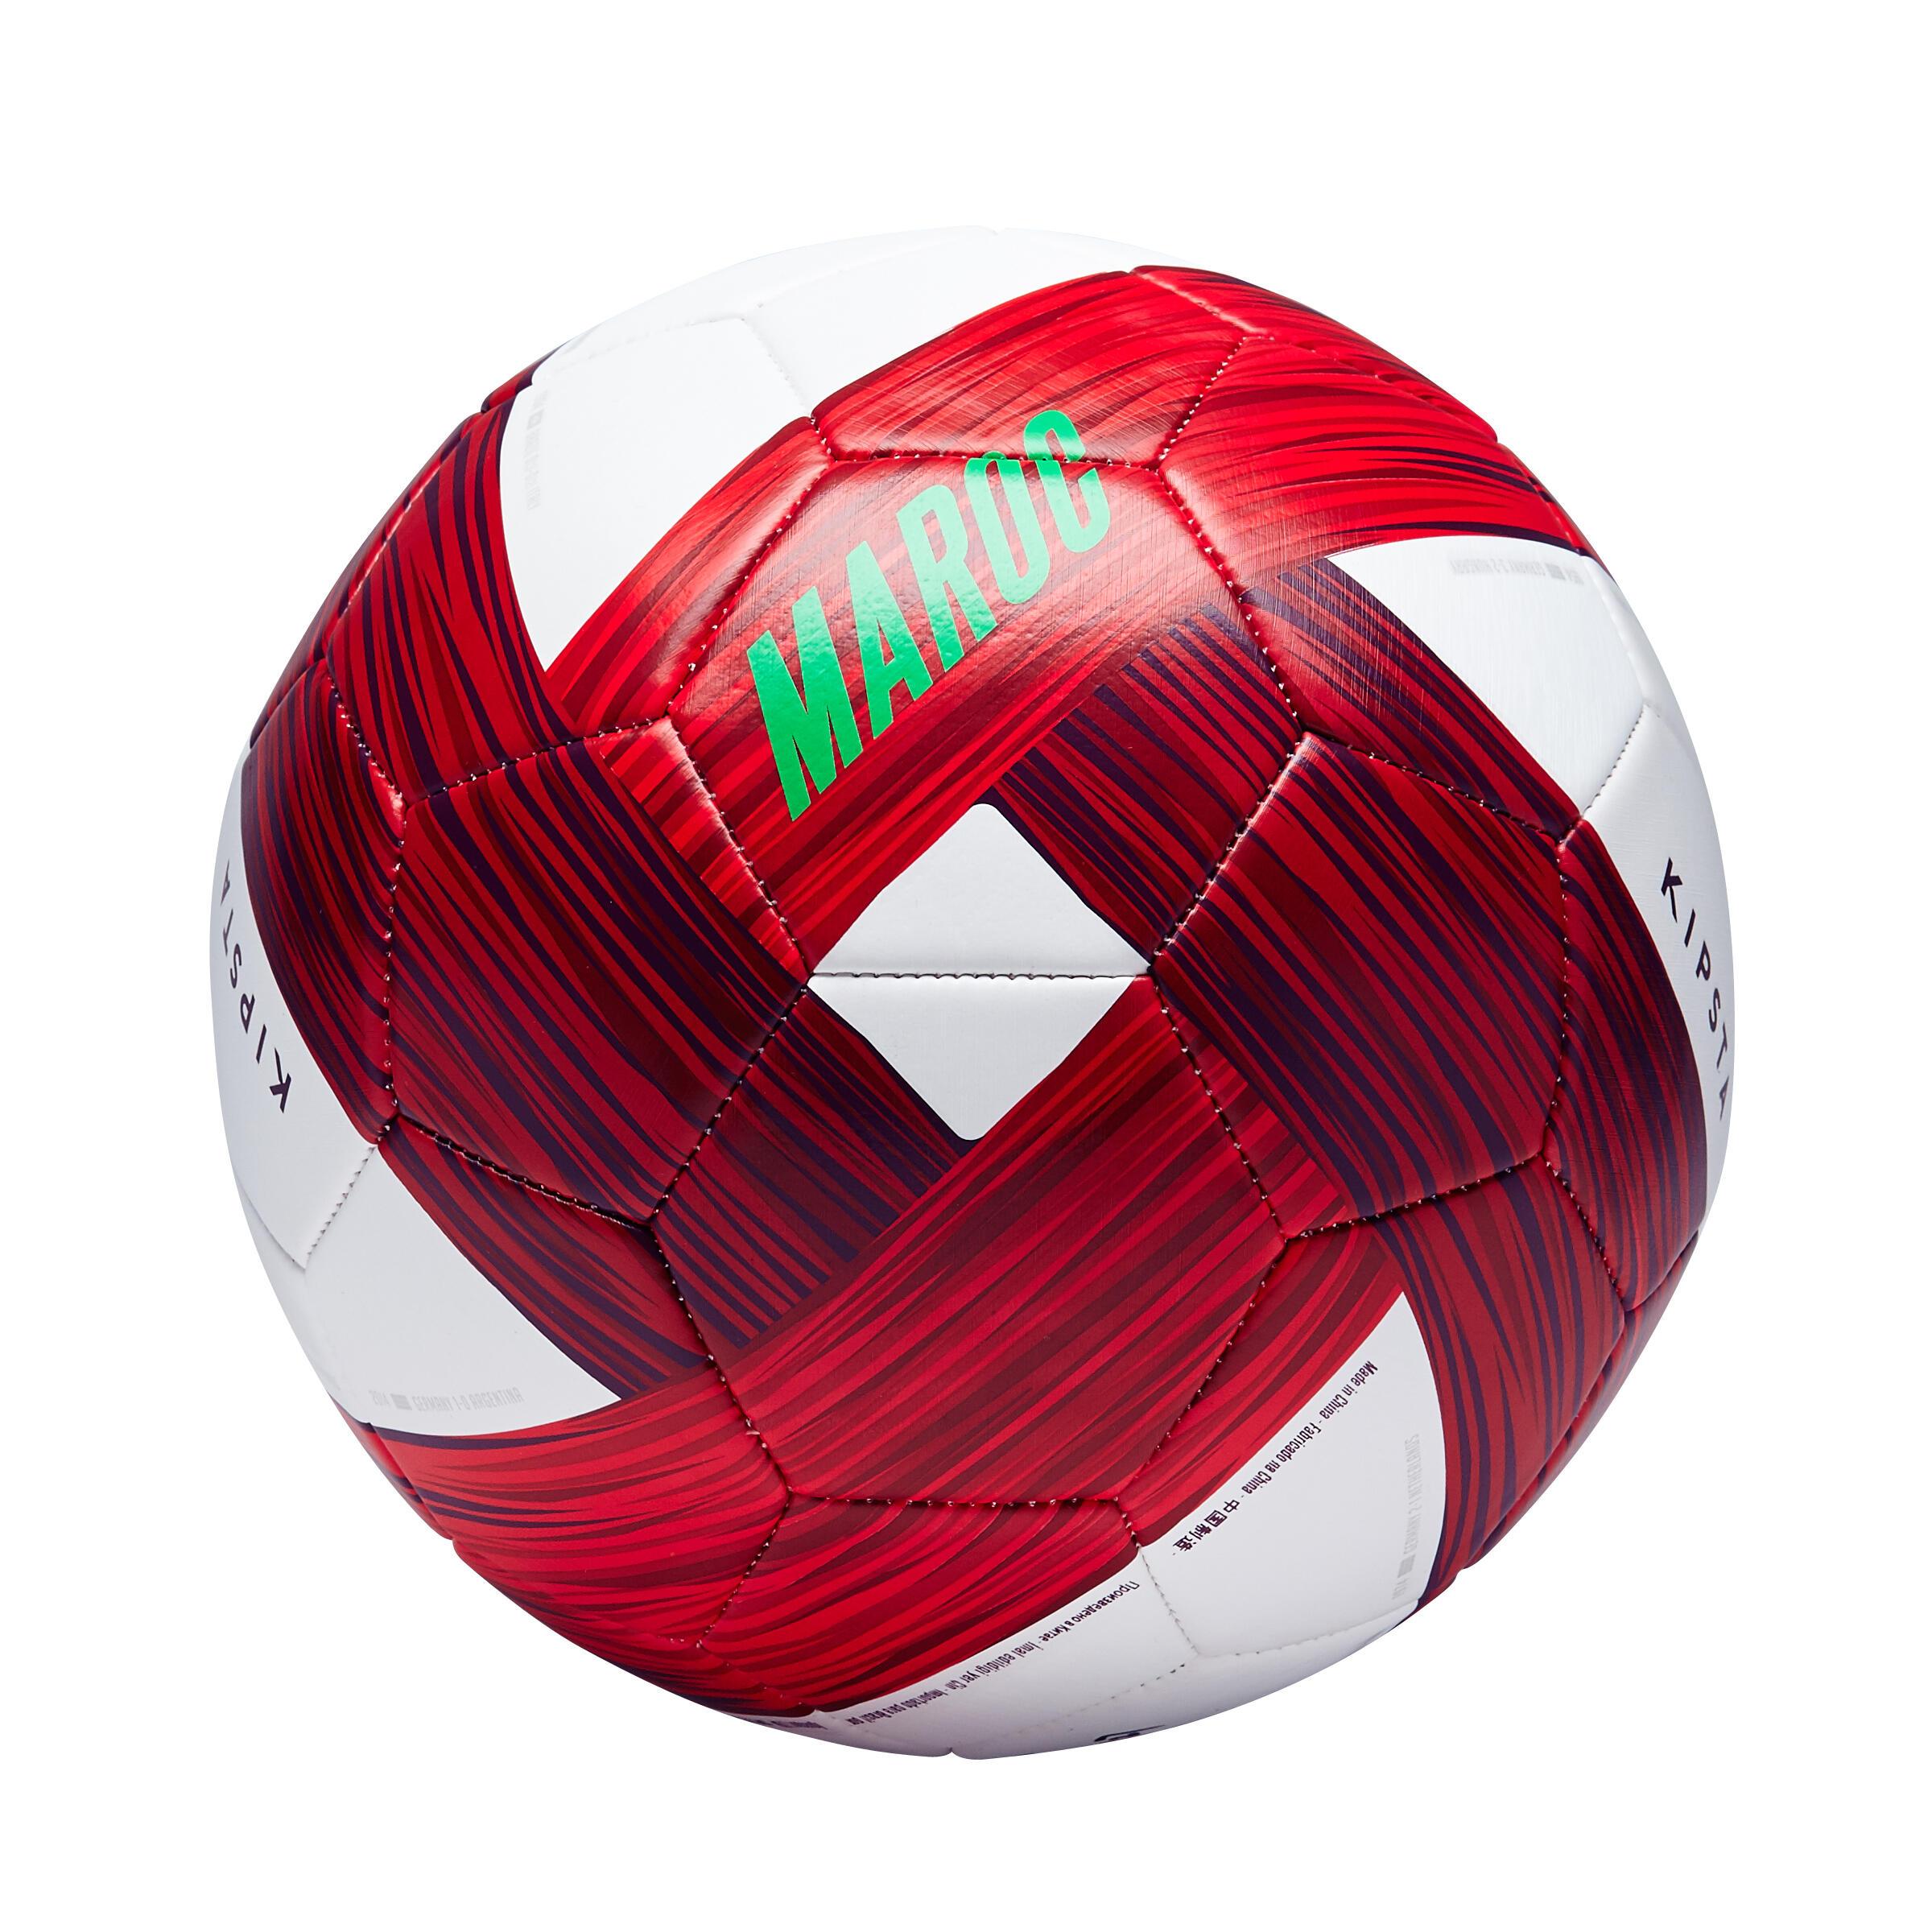 Kipsta Voetbal Marokko maat 5